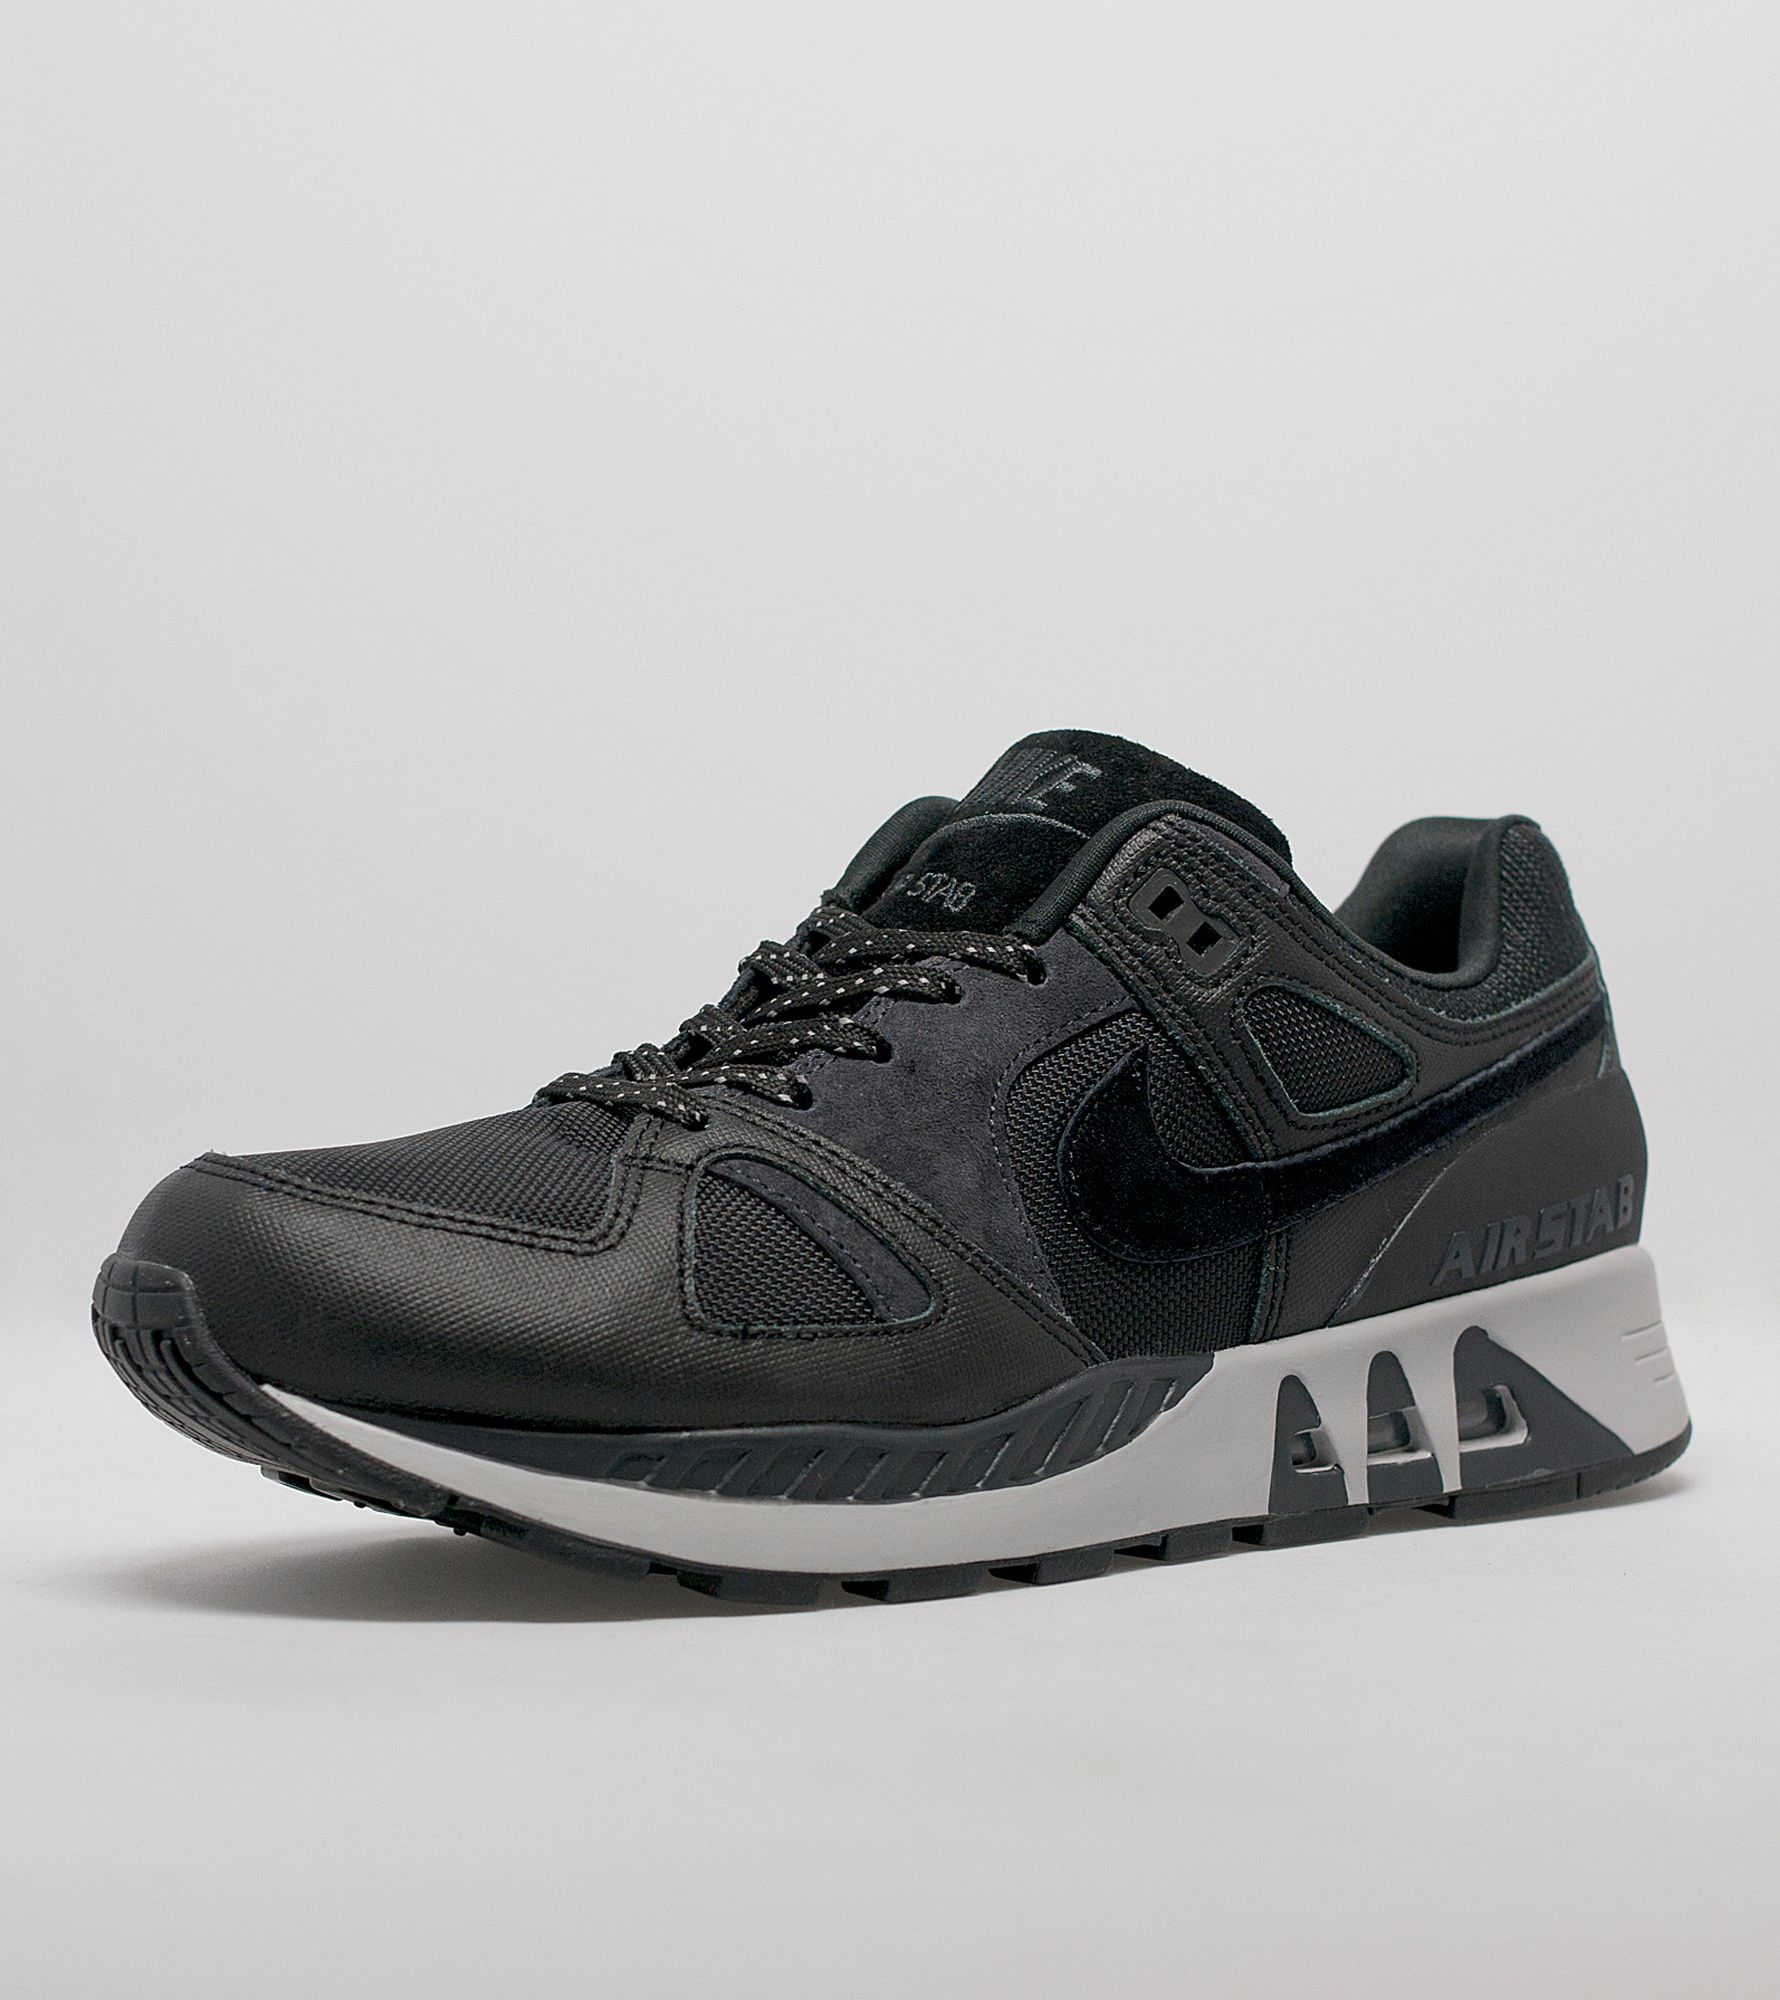 86044aee4ea69 Nike Air Stab | Size?